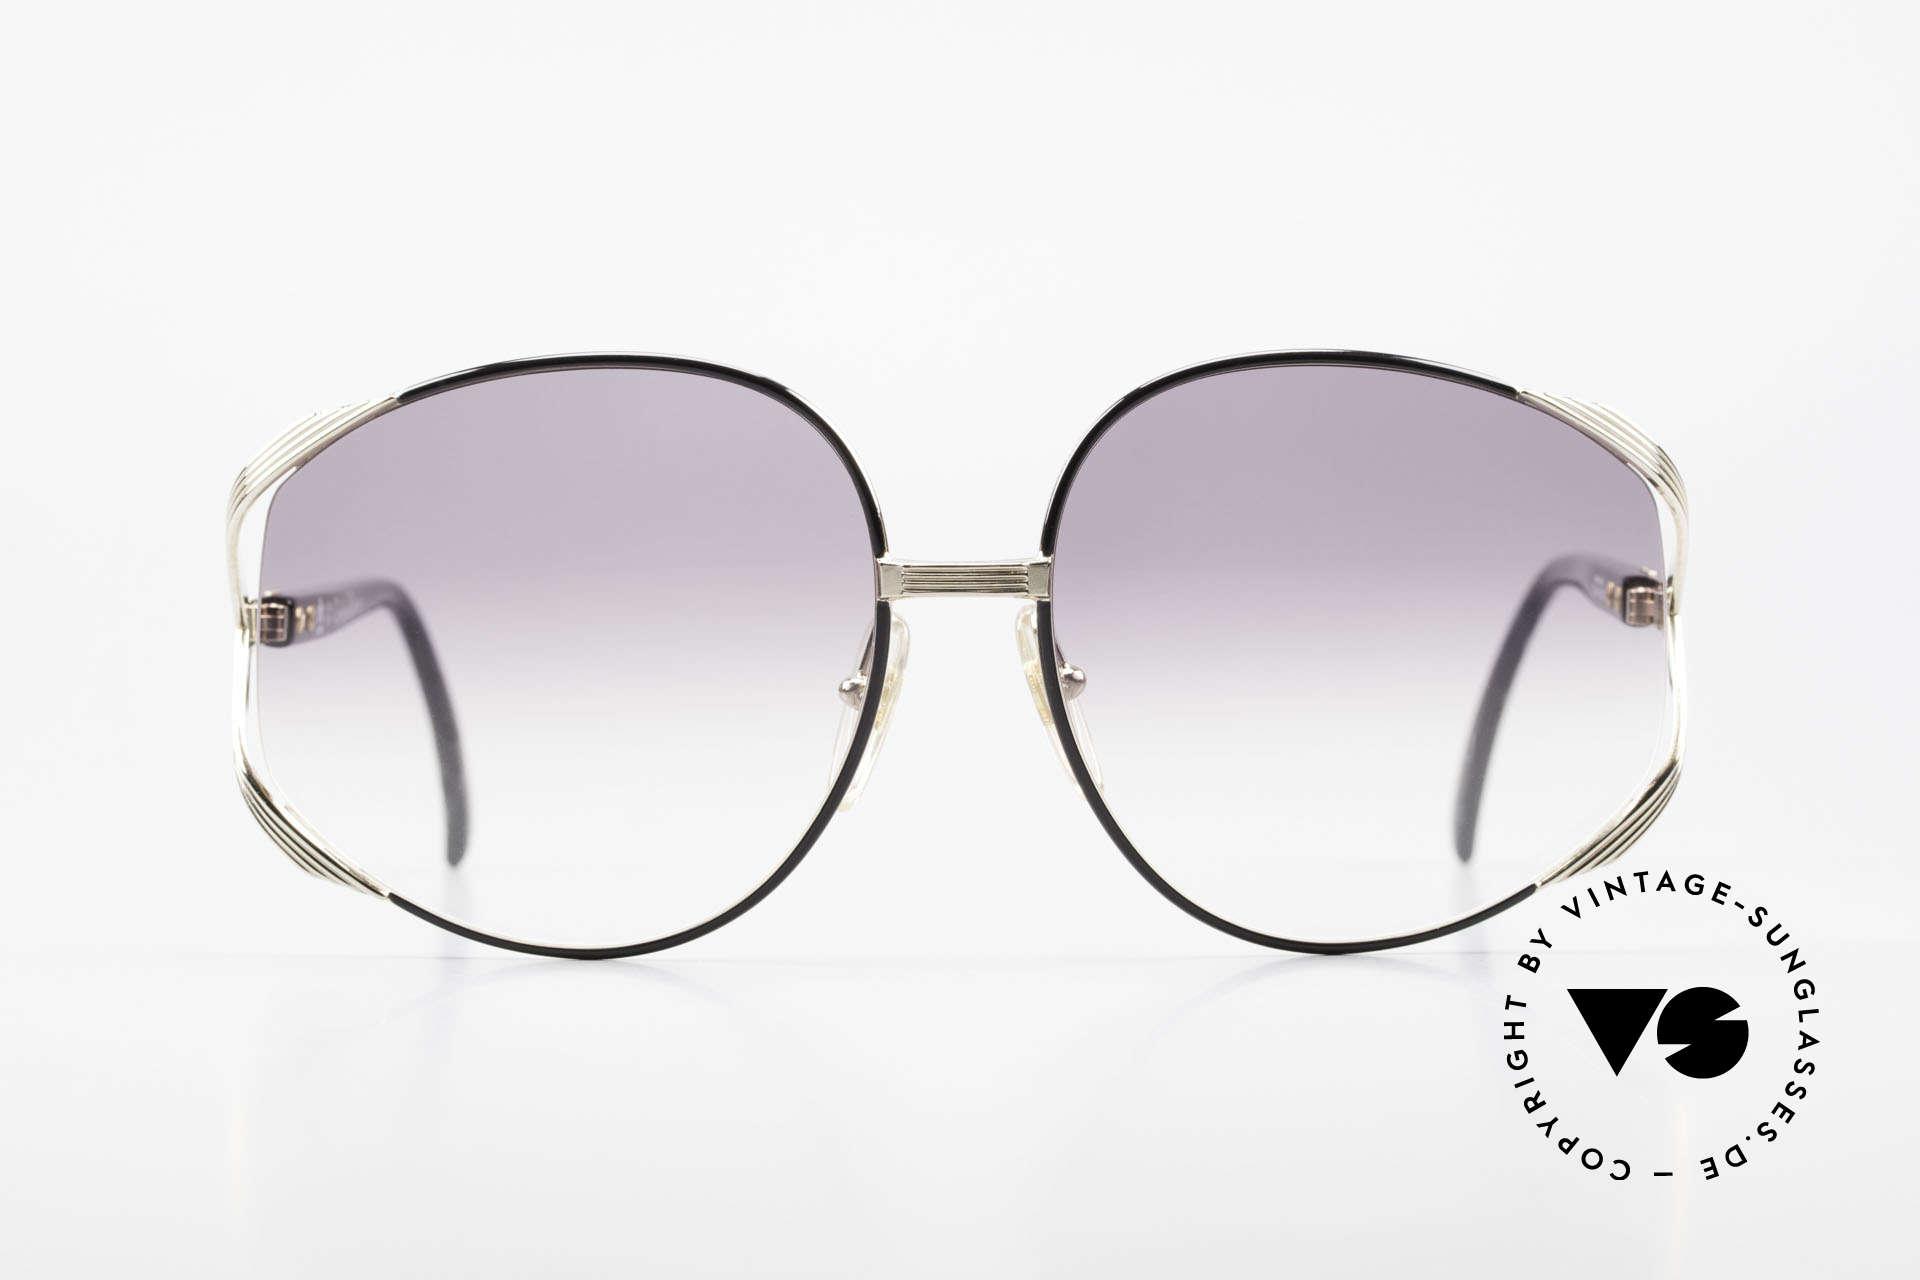 Christian Dior 2250 XL Oversized Shades 80's Ladies, feminine elegant design with huge gray-gradient lenses, Made for Women